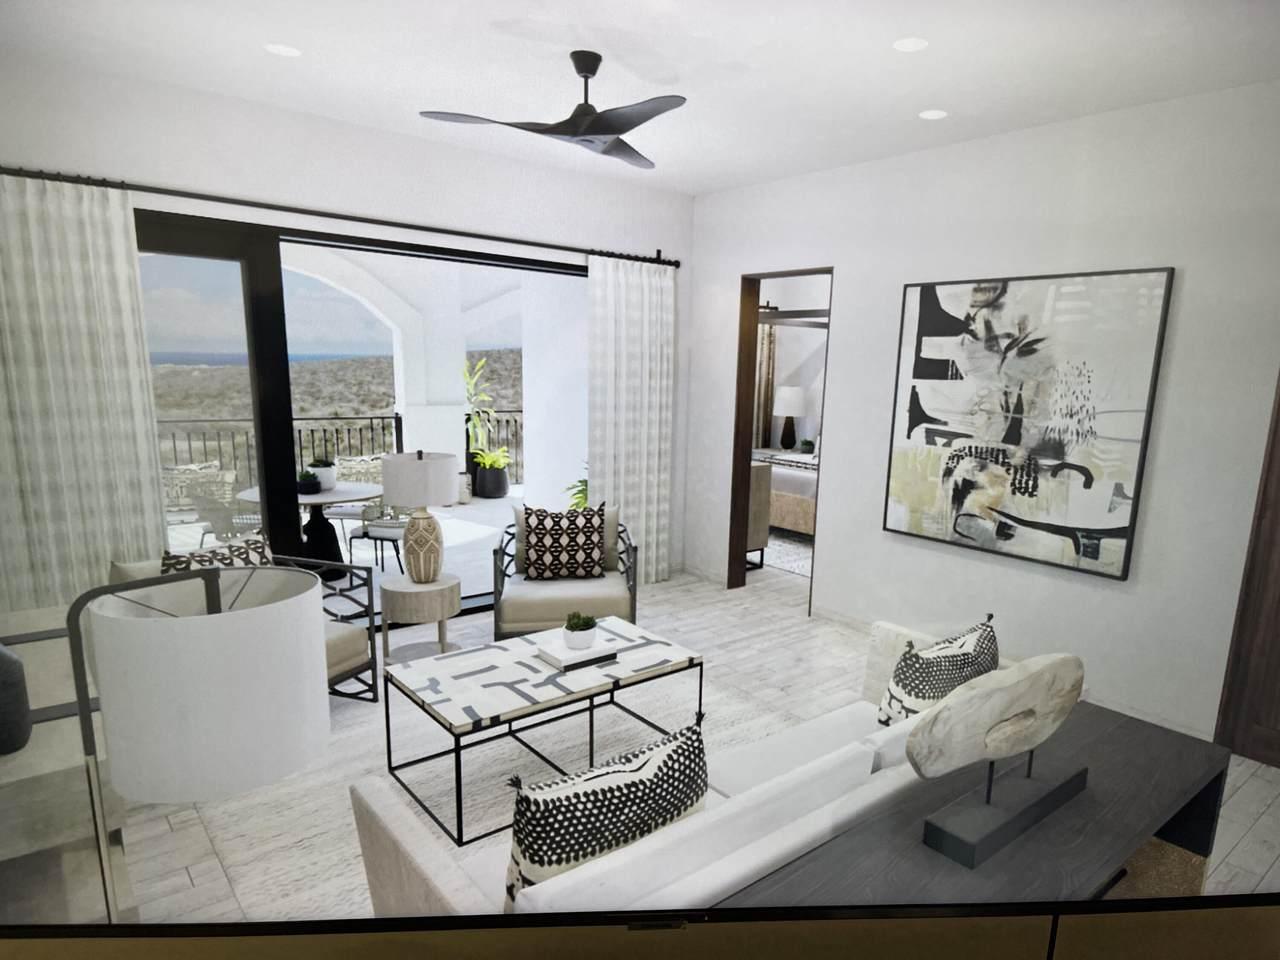 2 Bedroom Jacarandas Quivira - Photo 1